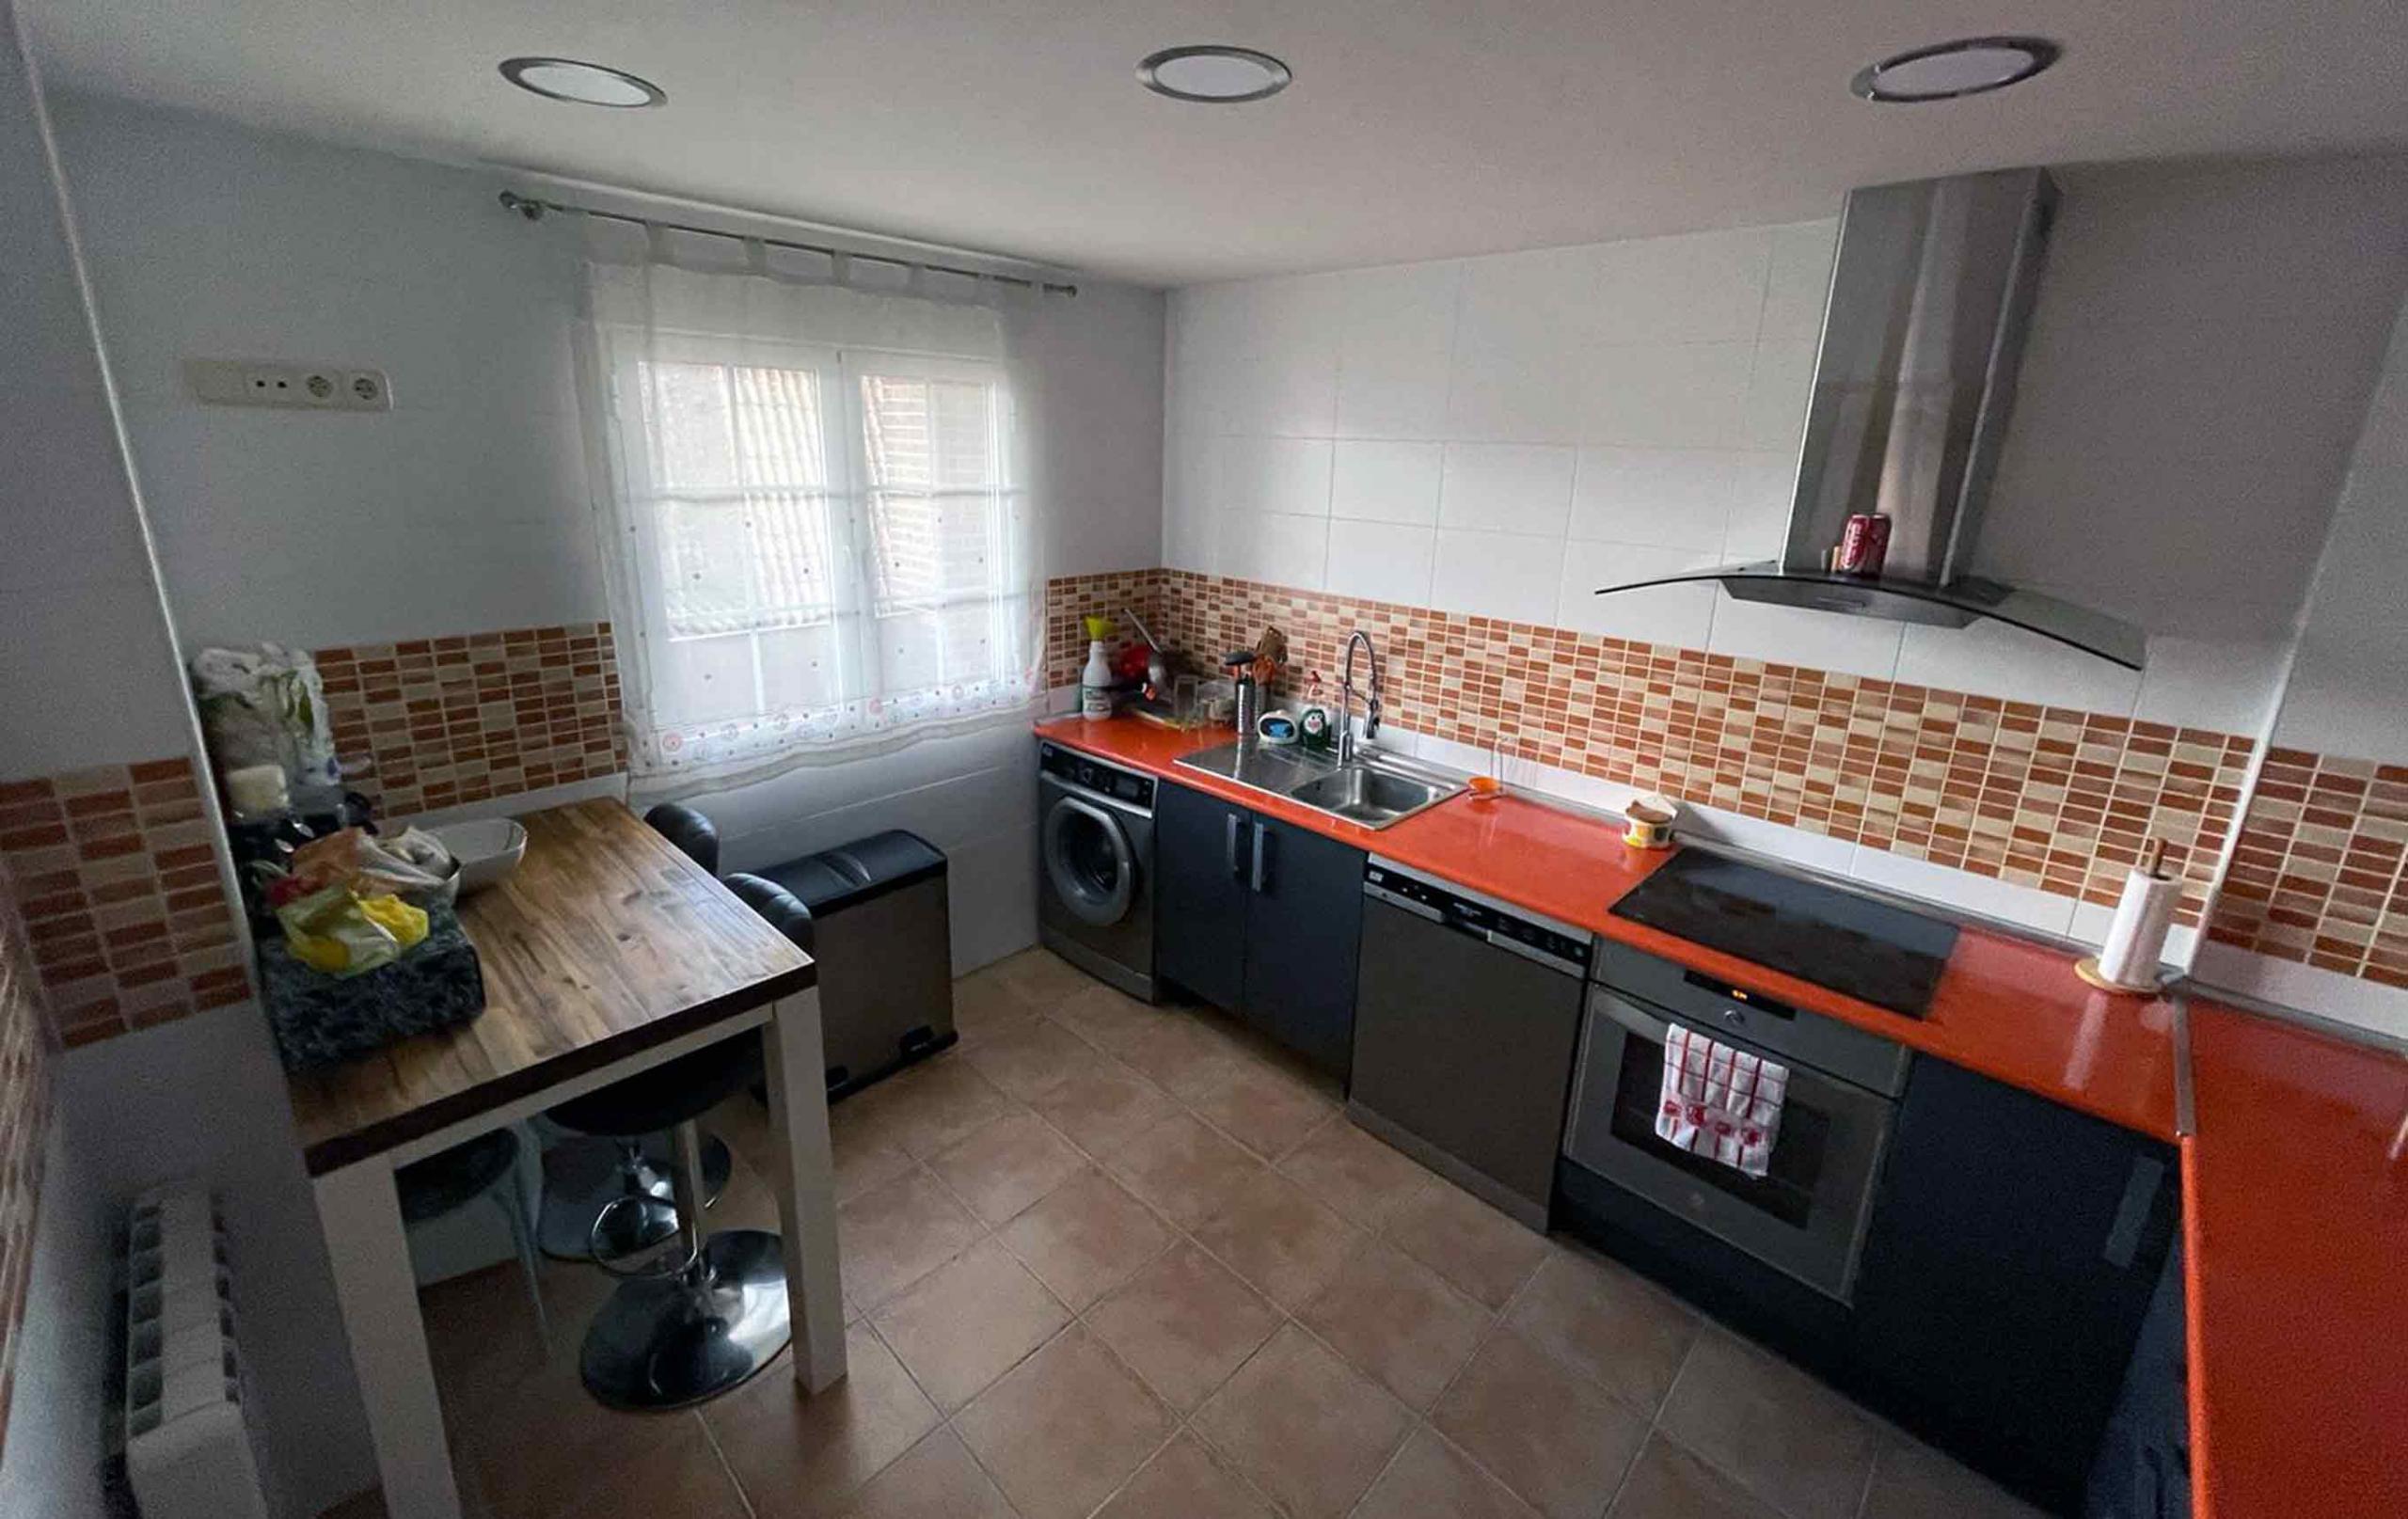 compra de duplex en oferta Valdeaveruelo Guadalajara